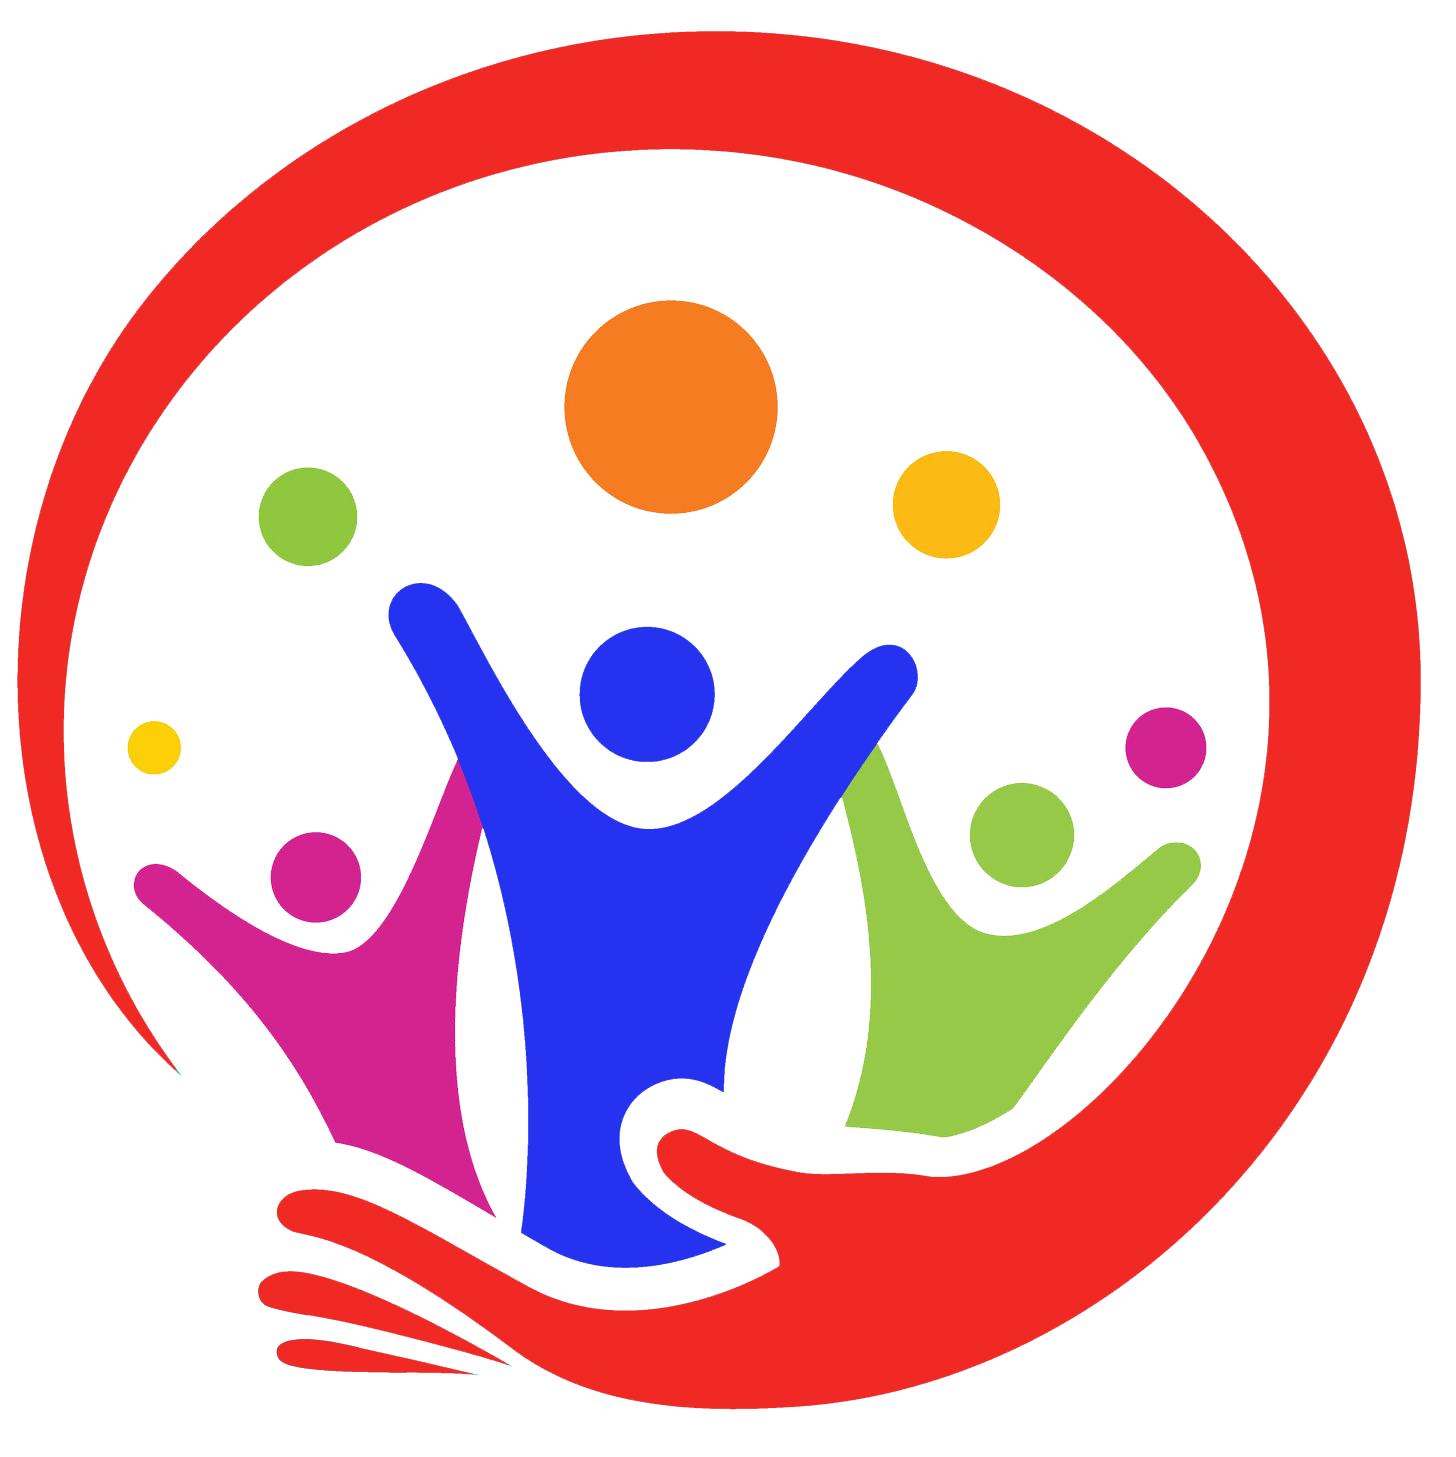 Asociatia Romana Pentru o Societate Informationala logo